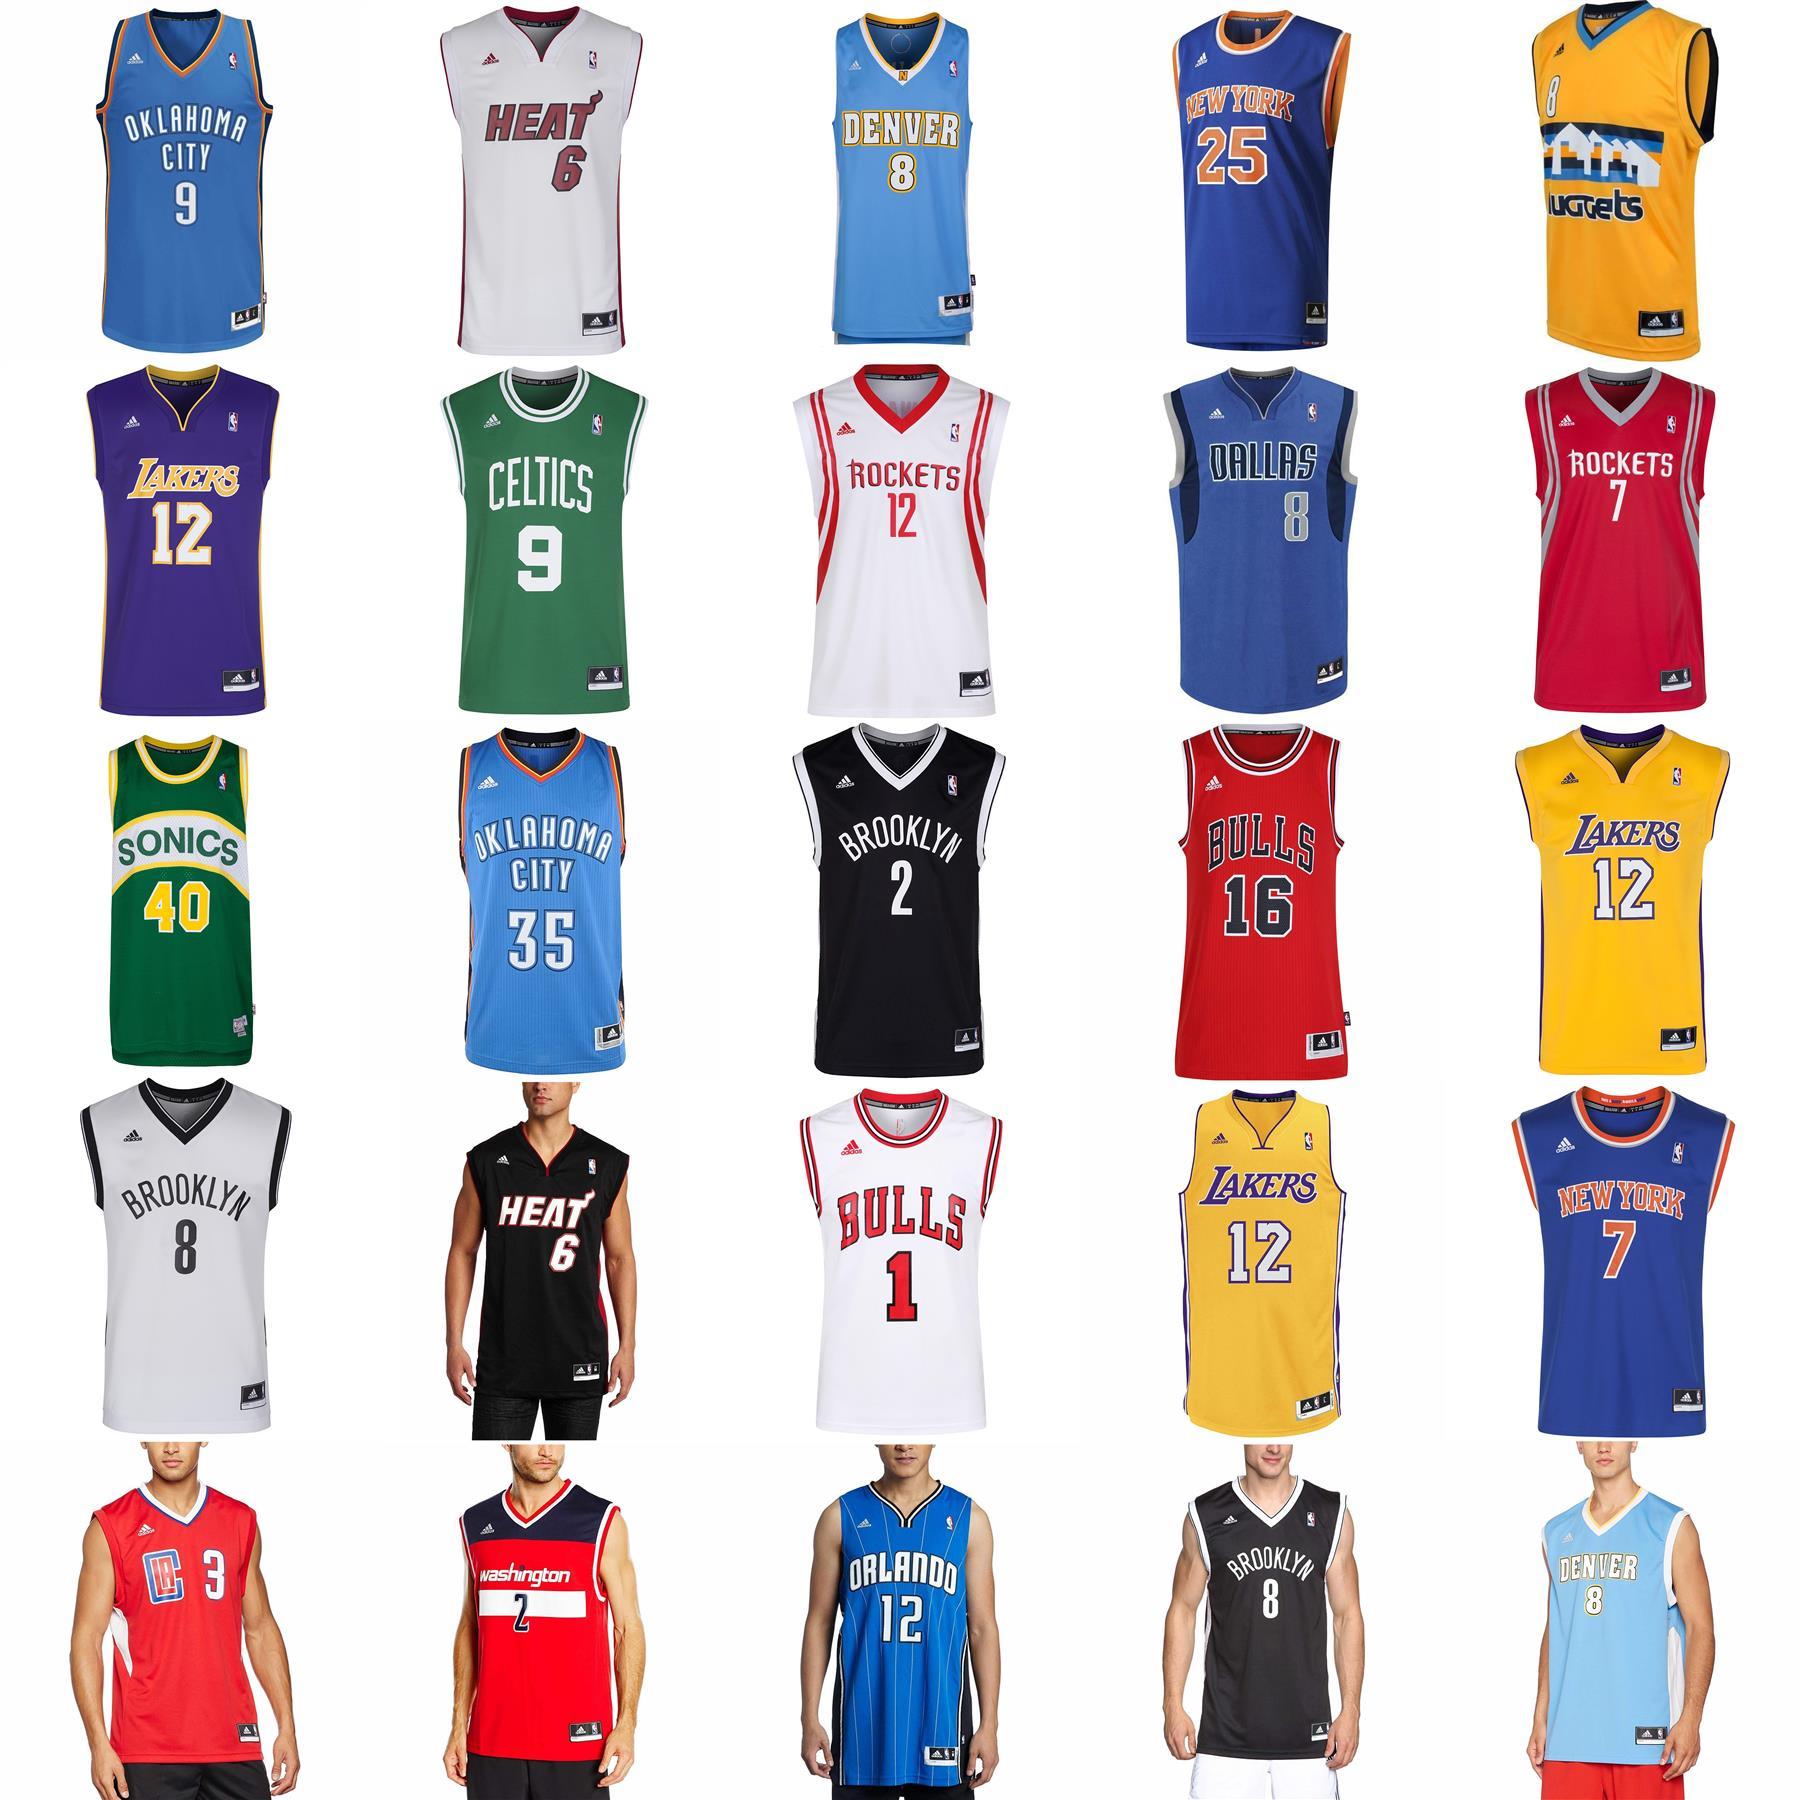 la licenciatura Final Teórico  adidas NBA BASKETBALL JERSEY ROCKETS LAKERS BULLS KNICKS NETS CELTICS SPURS  HEAT | eBay